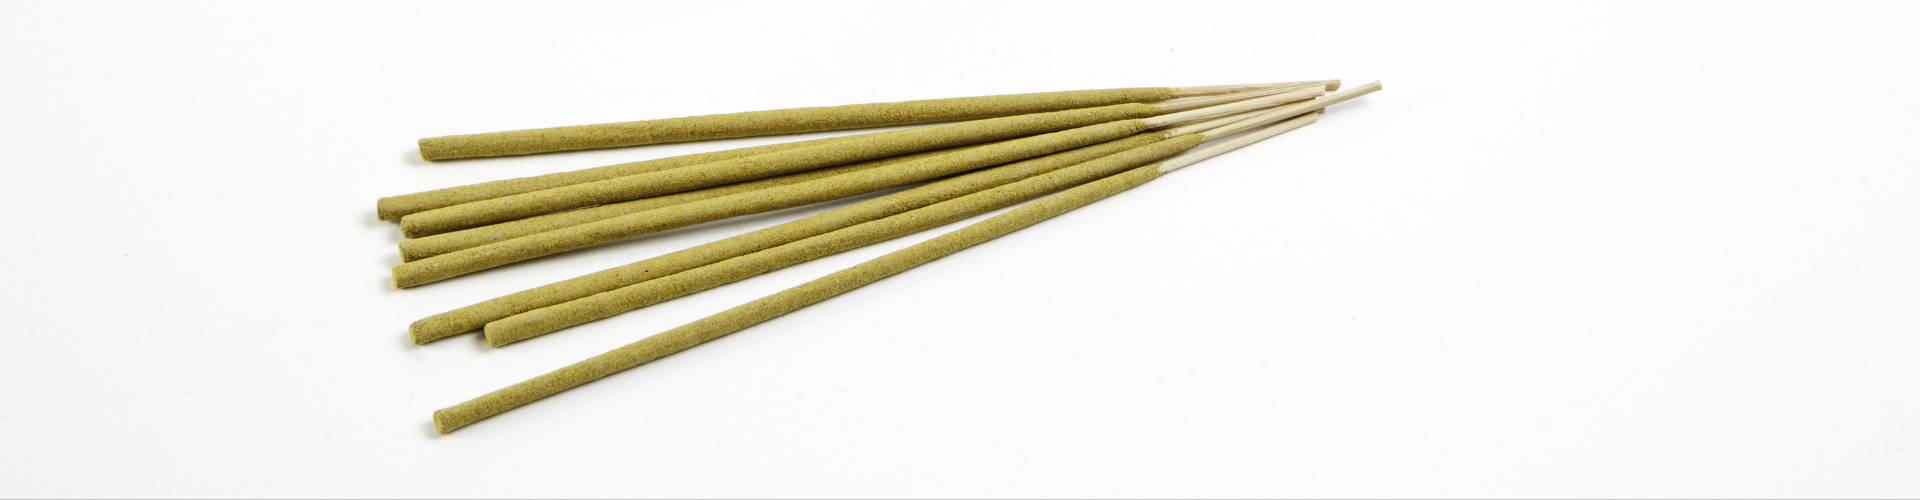 bamboo sandalwood incense sticks